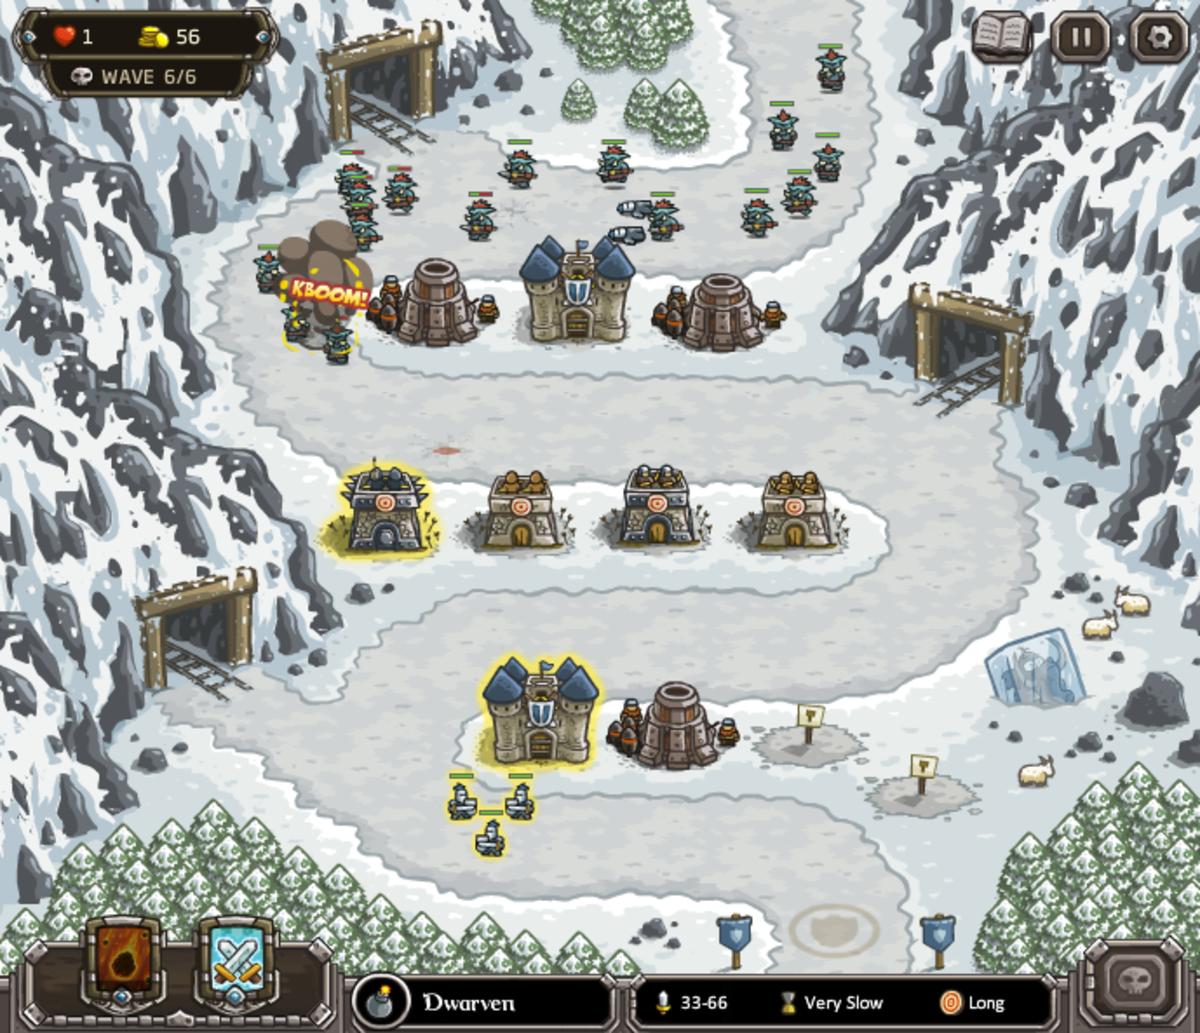 kingdom-rush-walkthrough-level-7-coldstep-mines